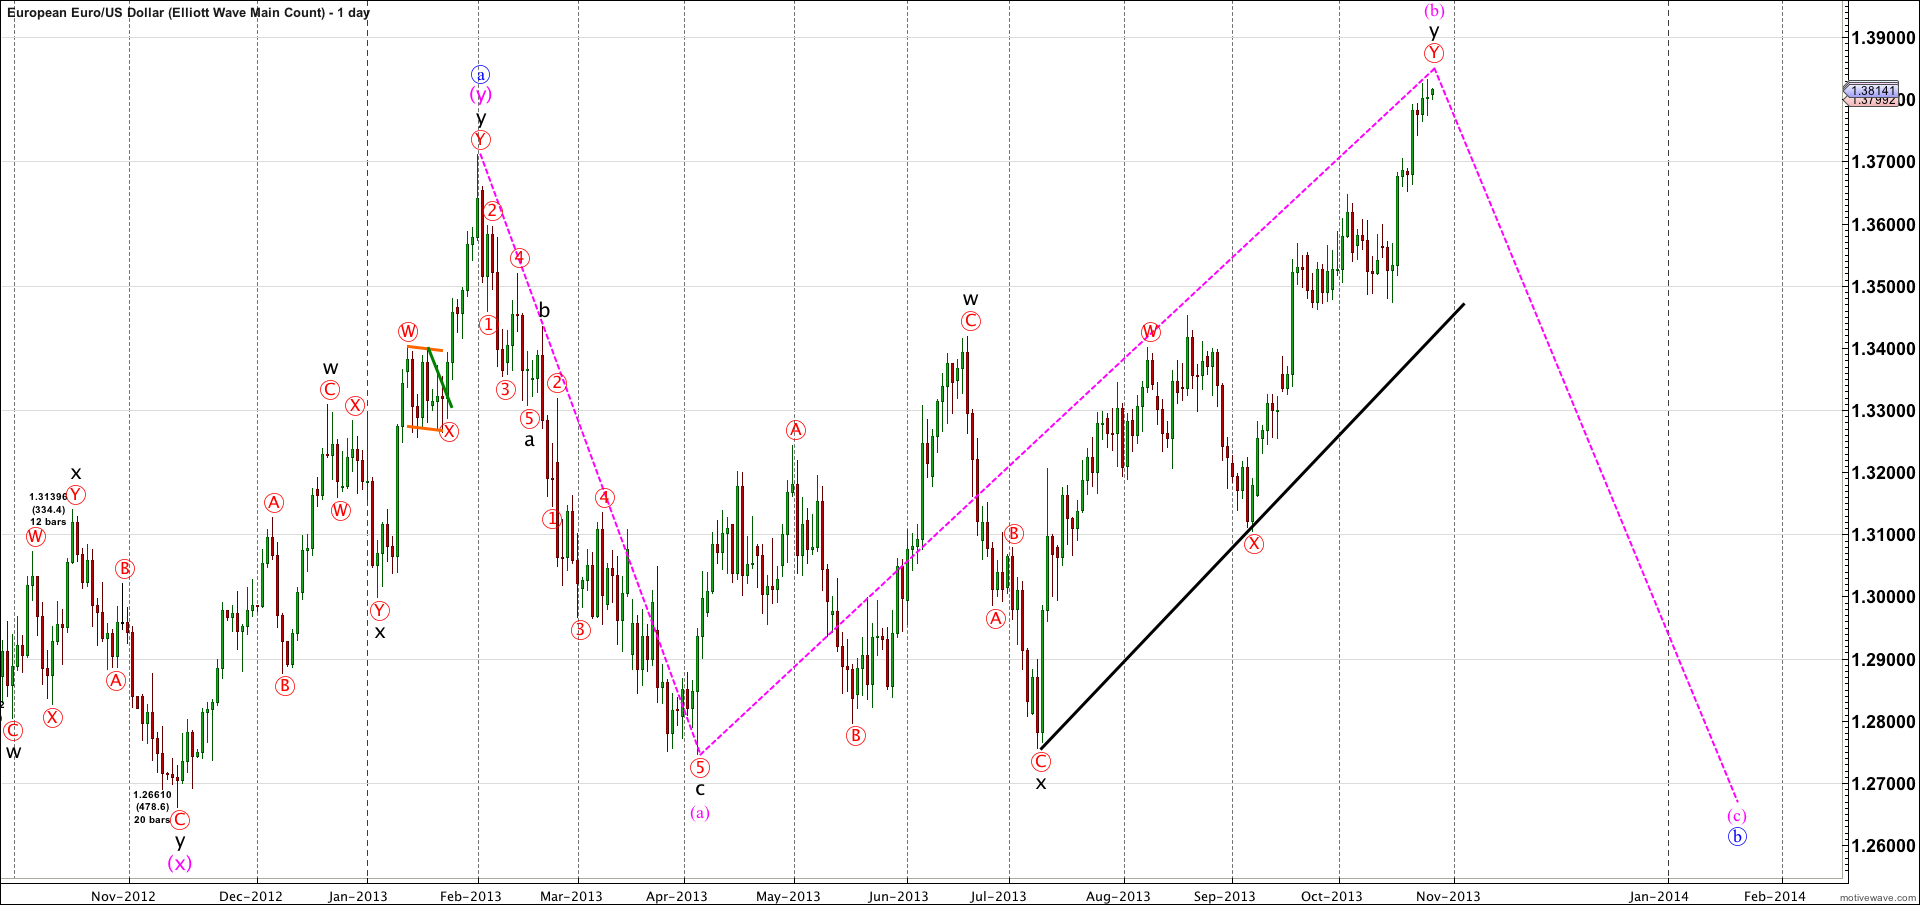 EURUSD-Elliott-Wave-Main-Count-Oct-27-2049-PM-1-day (1)